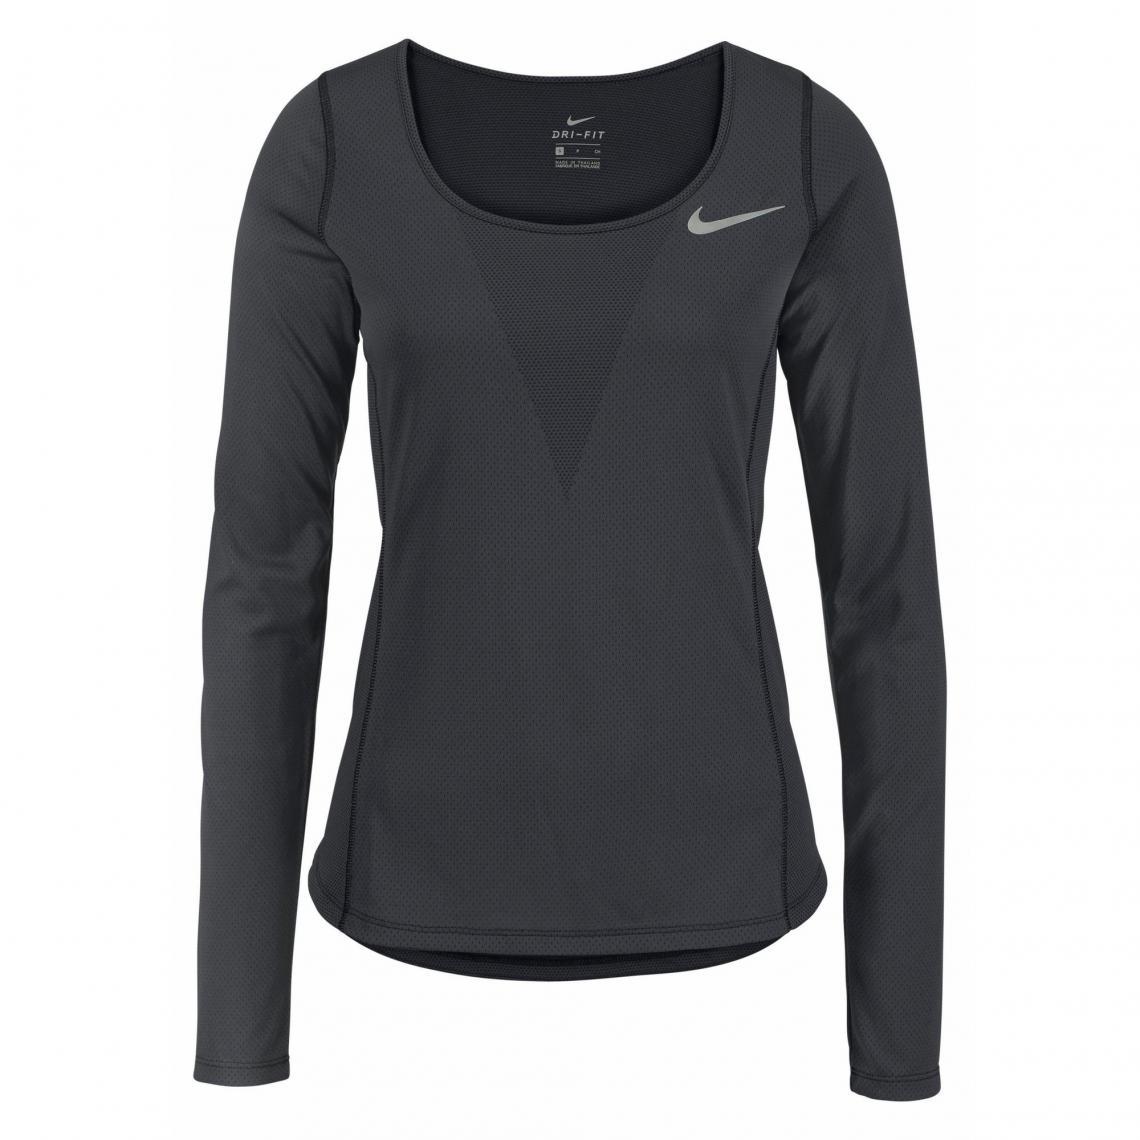 299bc4e9386ff Tee-shirt de sport manches longues femme Dri-FIT ZNL Classic Relay Nike -